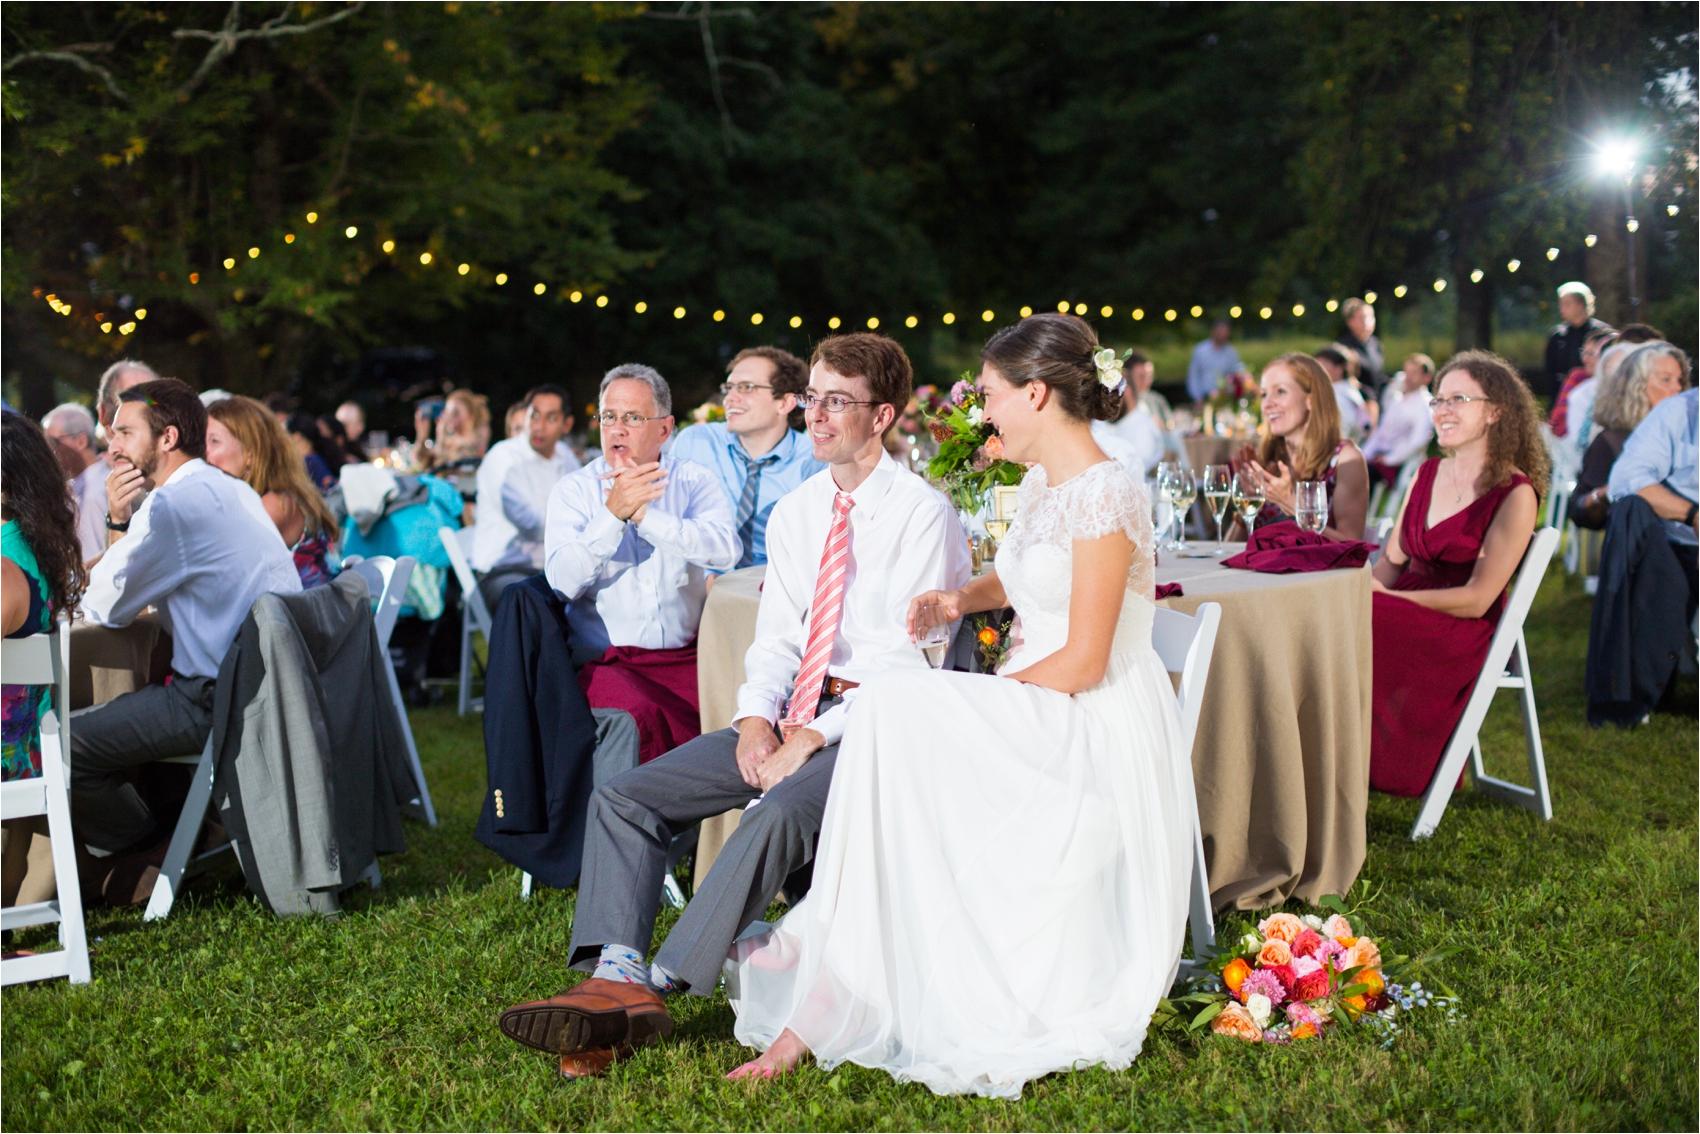 Feather-and-Oak-Rainforest-Trust-Virginia-Wedding-0049.jpg